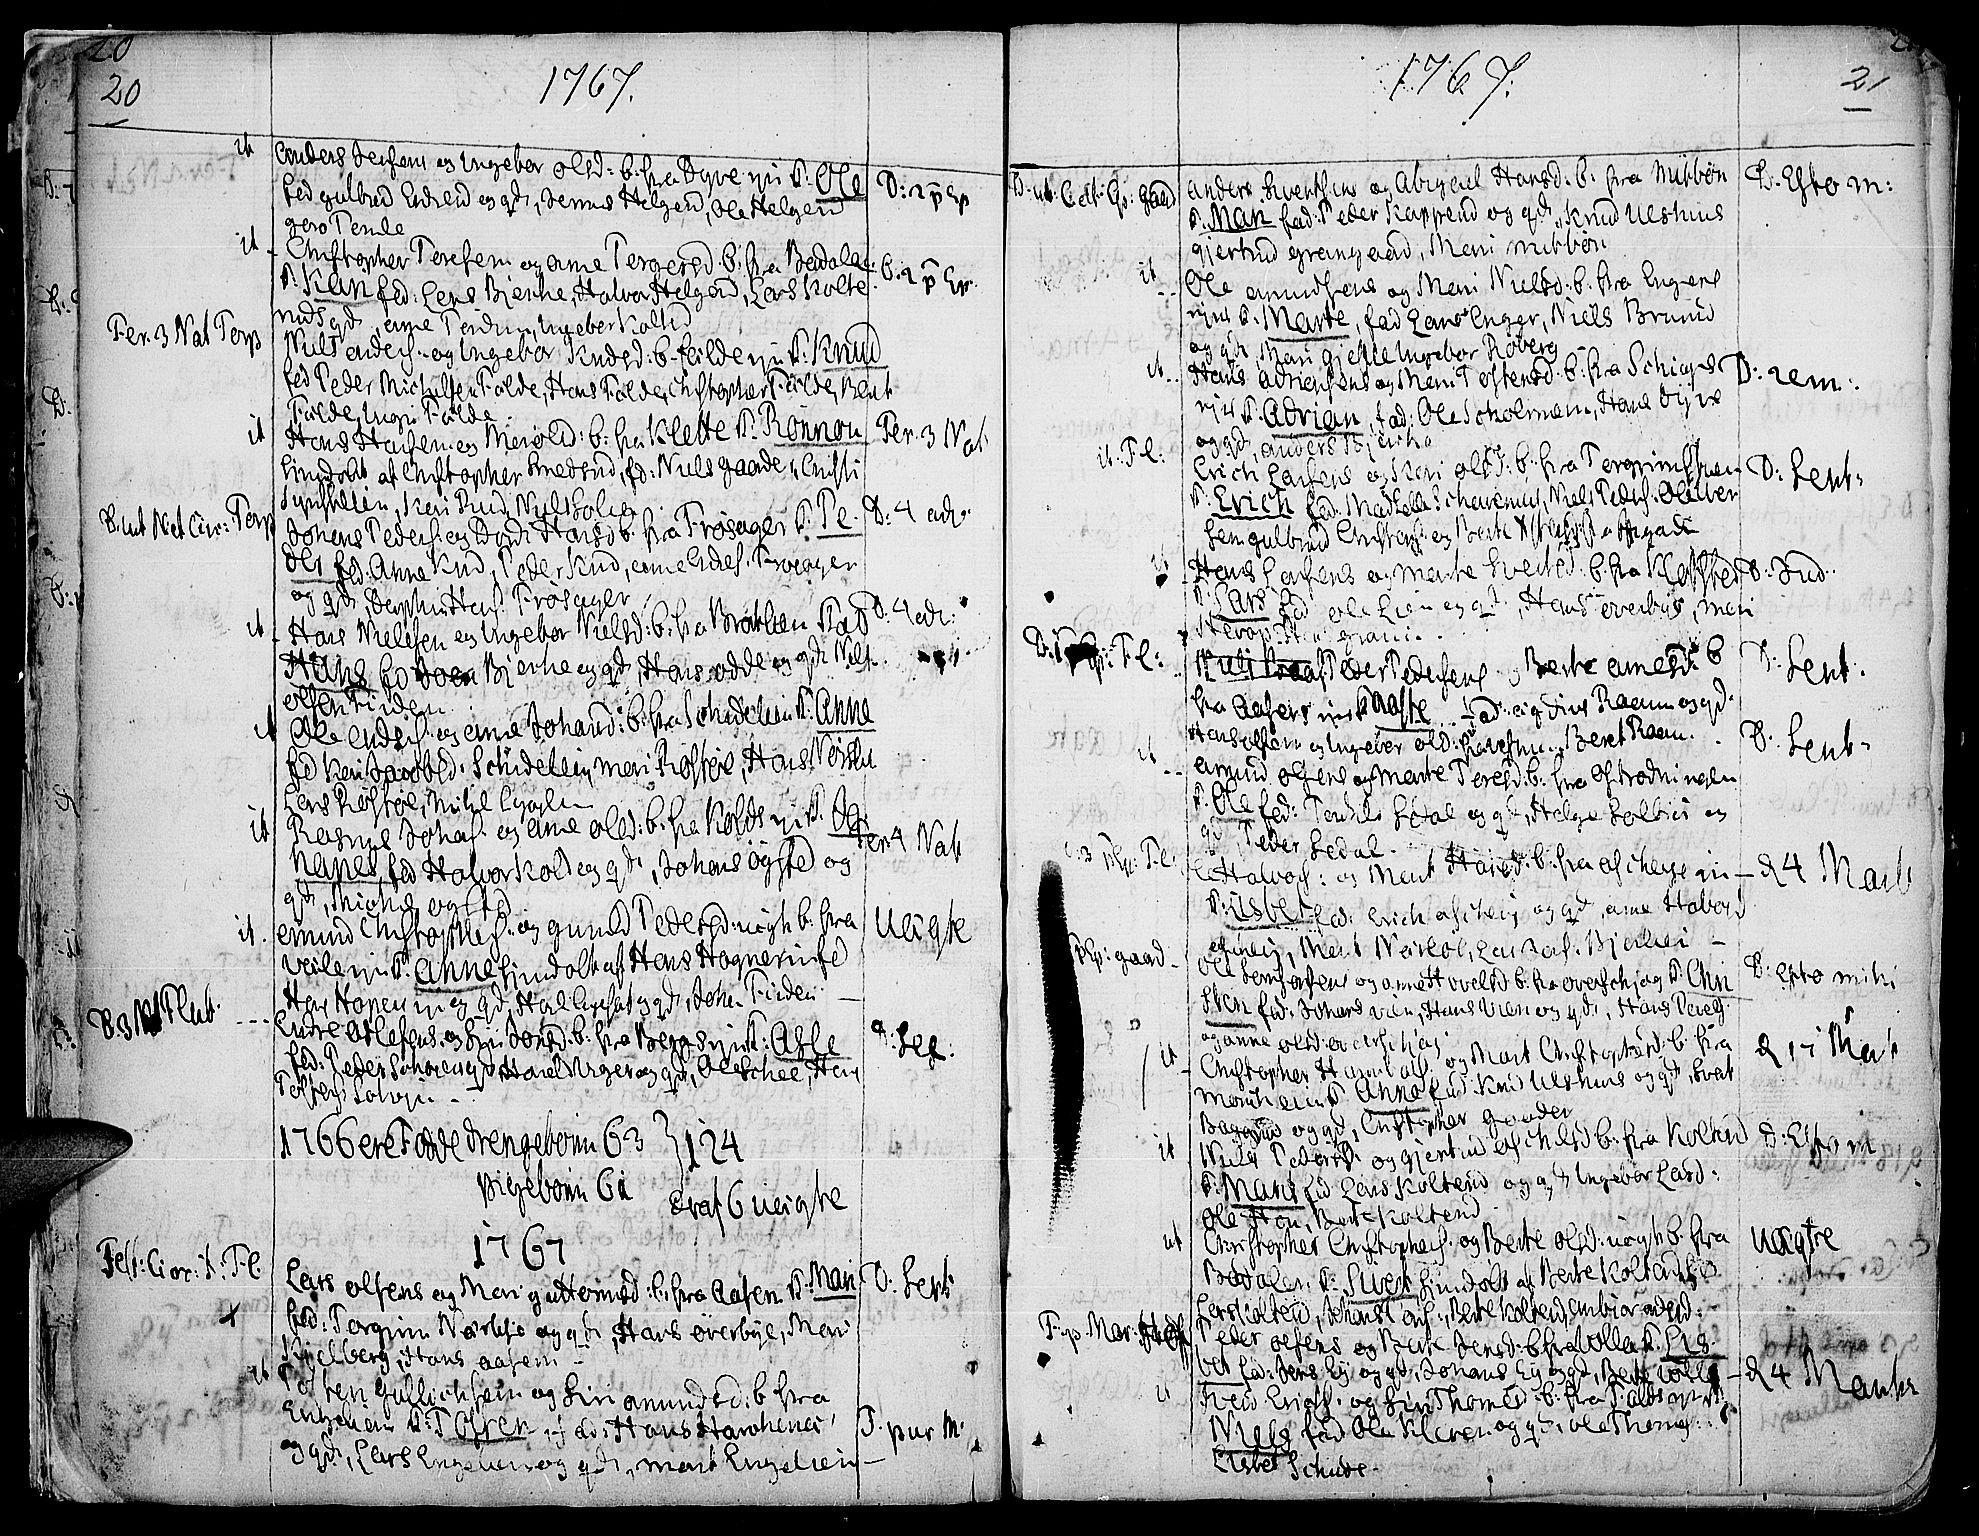 SAH, Land prestekontor, Ministerialbok nr. 5, 1765-1784, s. 20-21